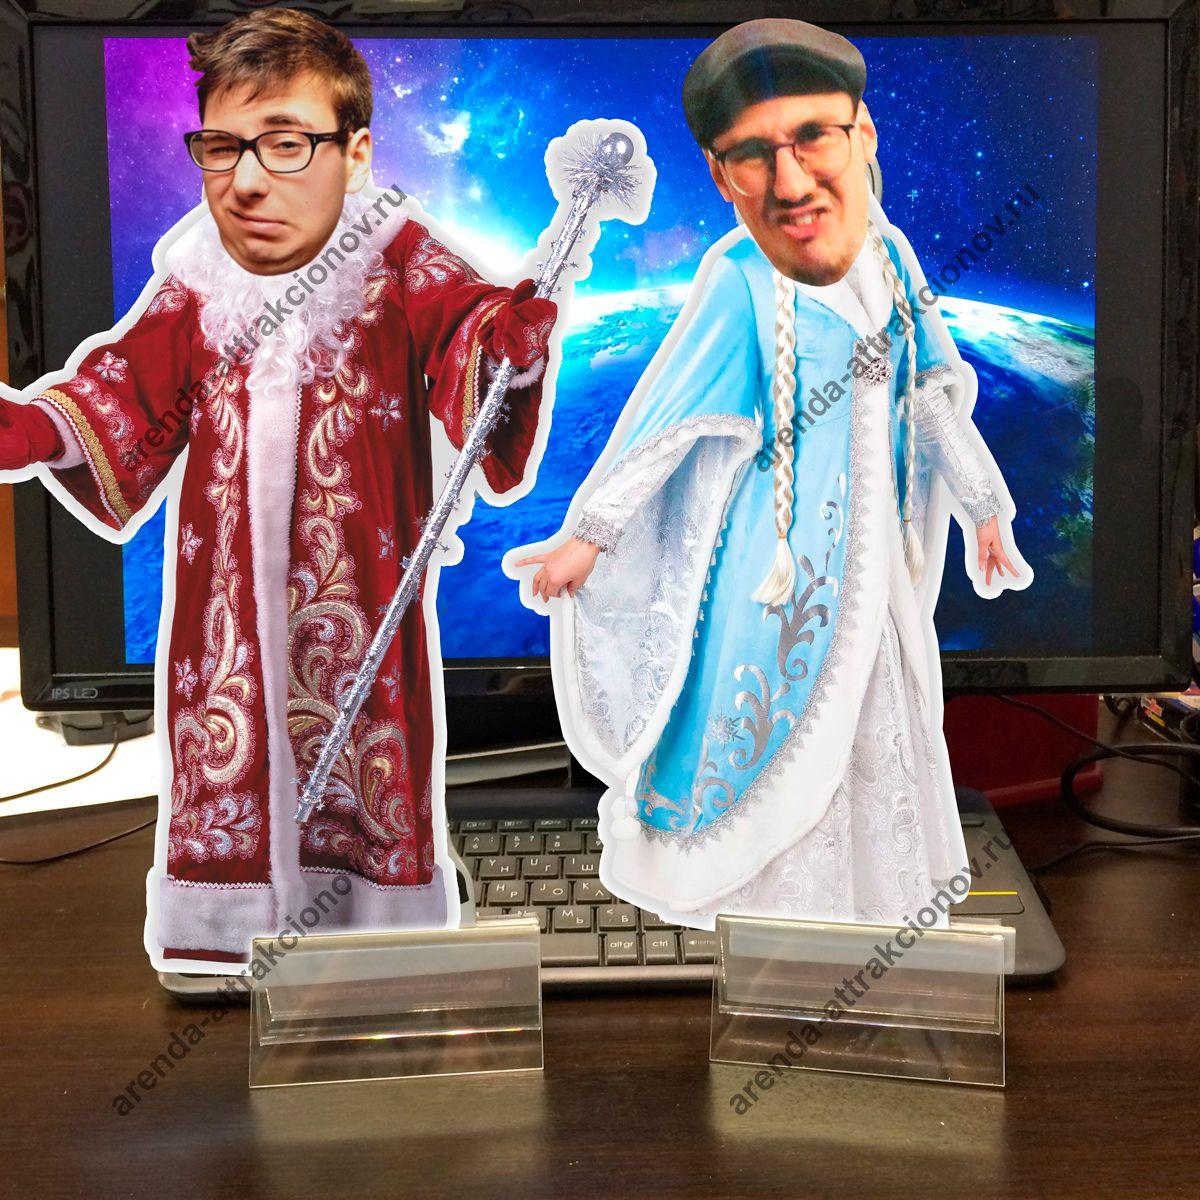 Новогодний Промо Оскар на Новый год